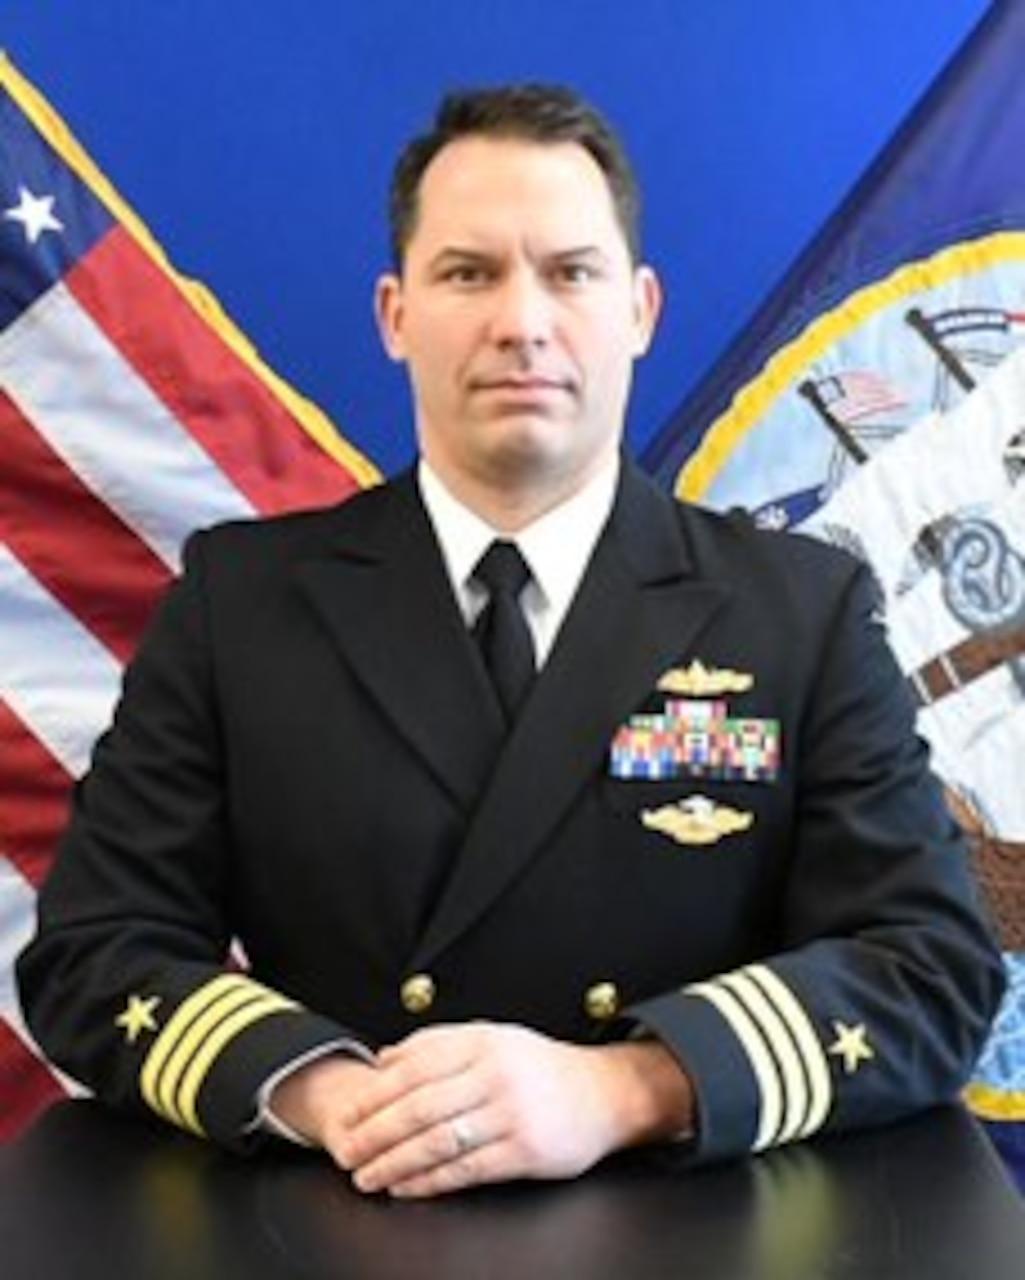 Commander Chris Polnaszek